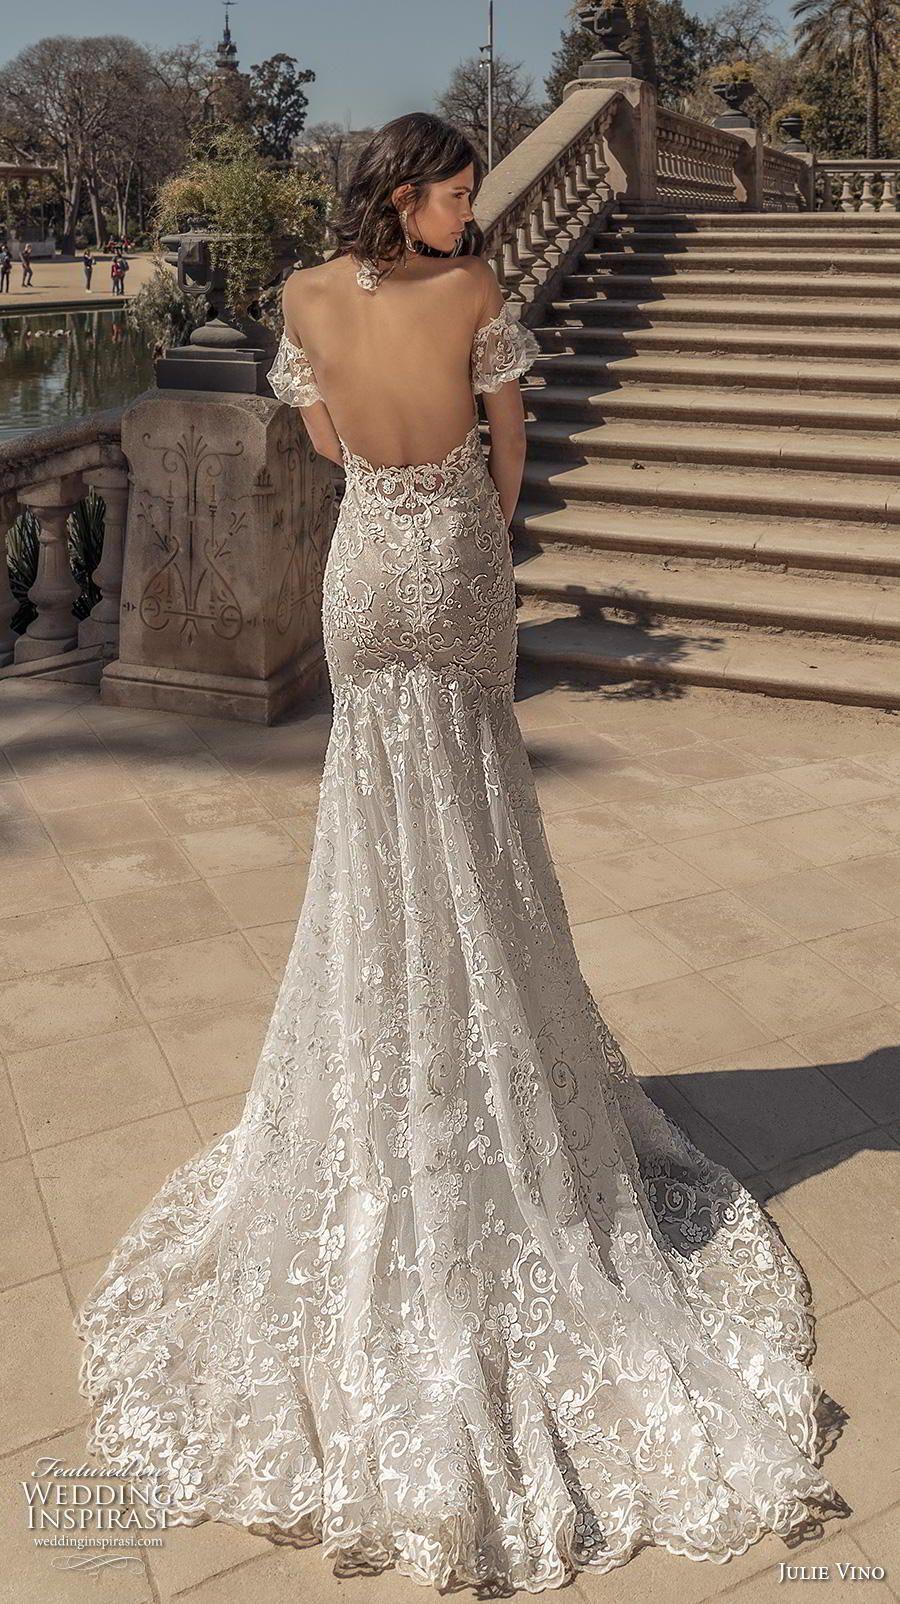 Julie Vino Spring 2020 Wedding Dresses Barcelona Bridal Collection Wedding Inspirasi Demetrios Wedding Dress Wedding Dress Trends Wedding Dresses 2020 [ 1604 x 900 Pixel ]